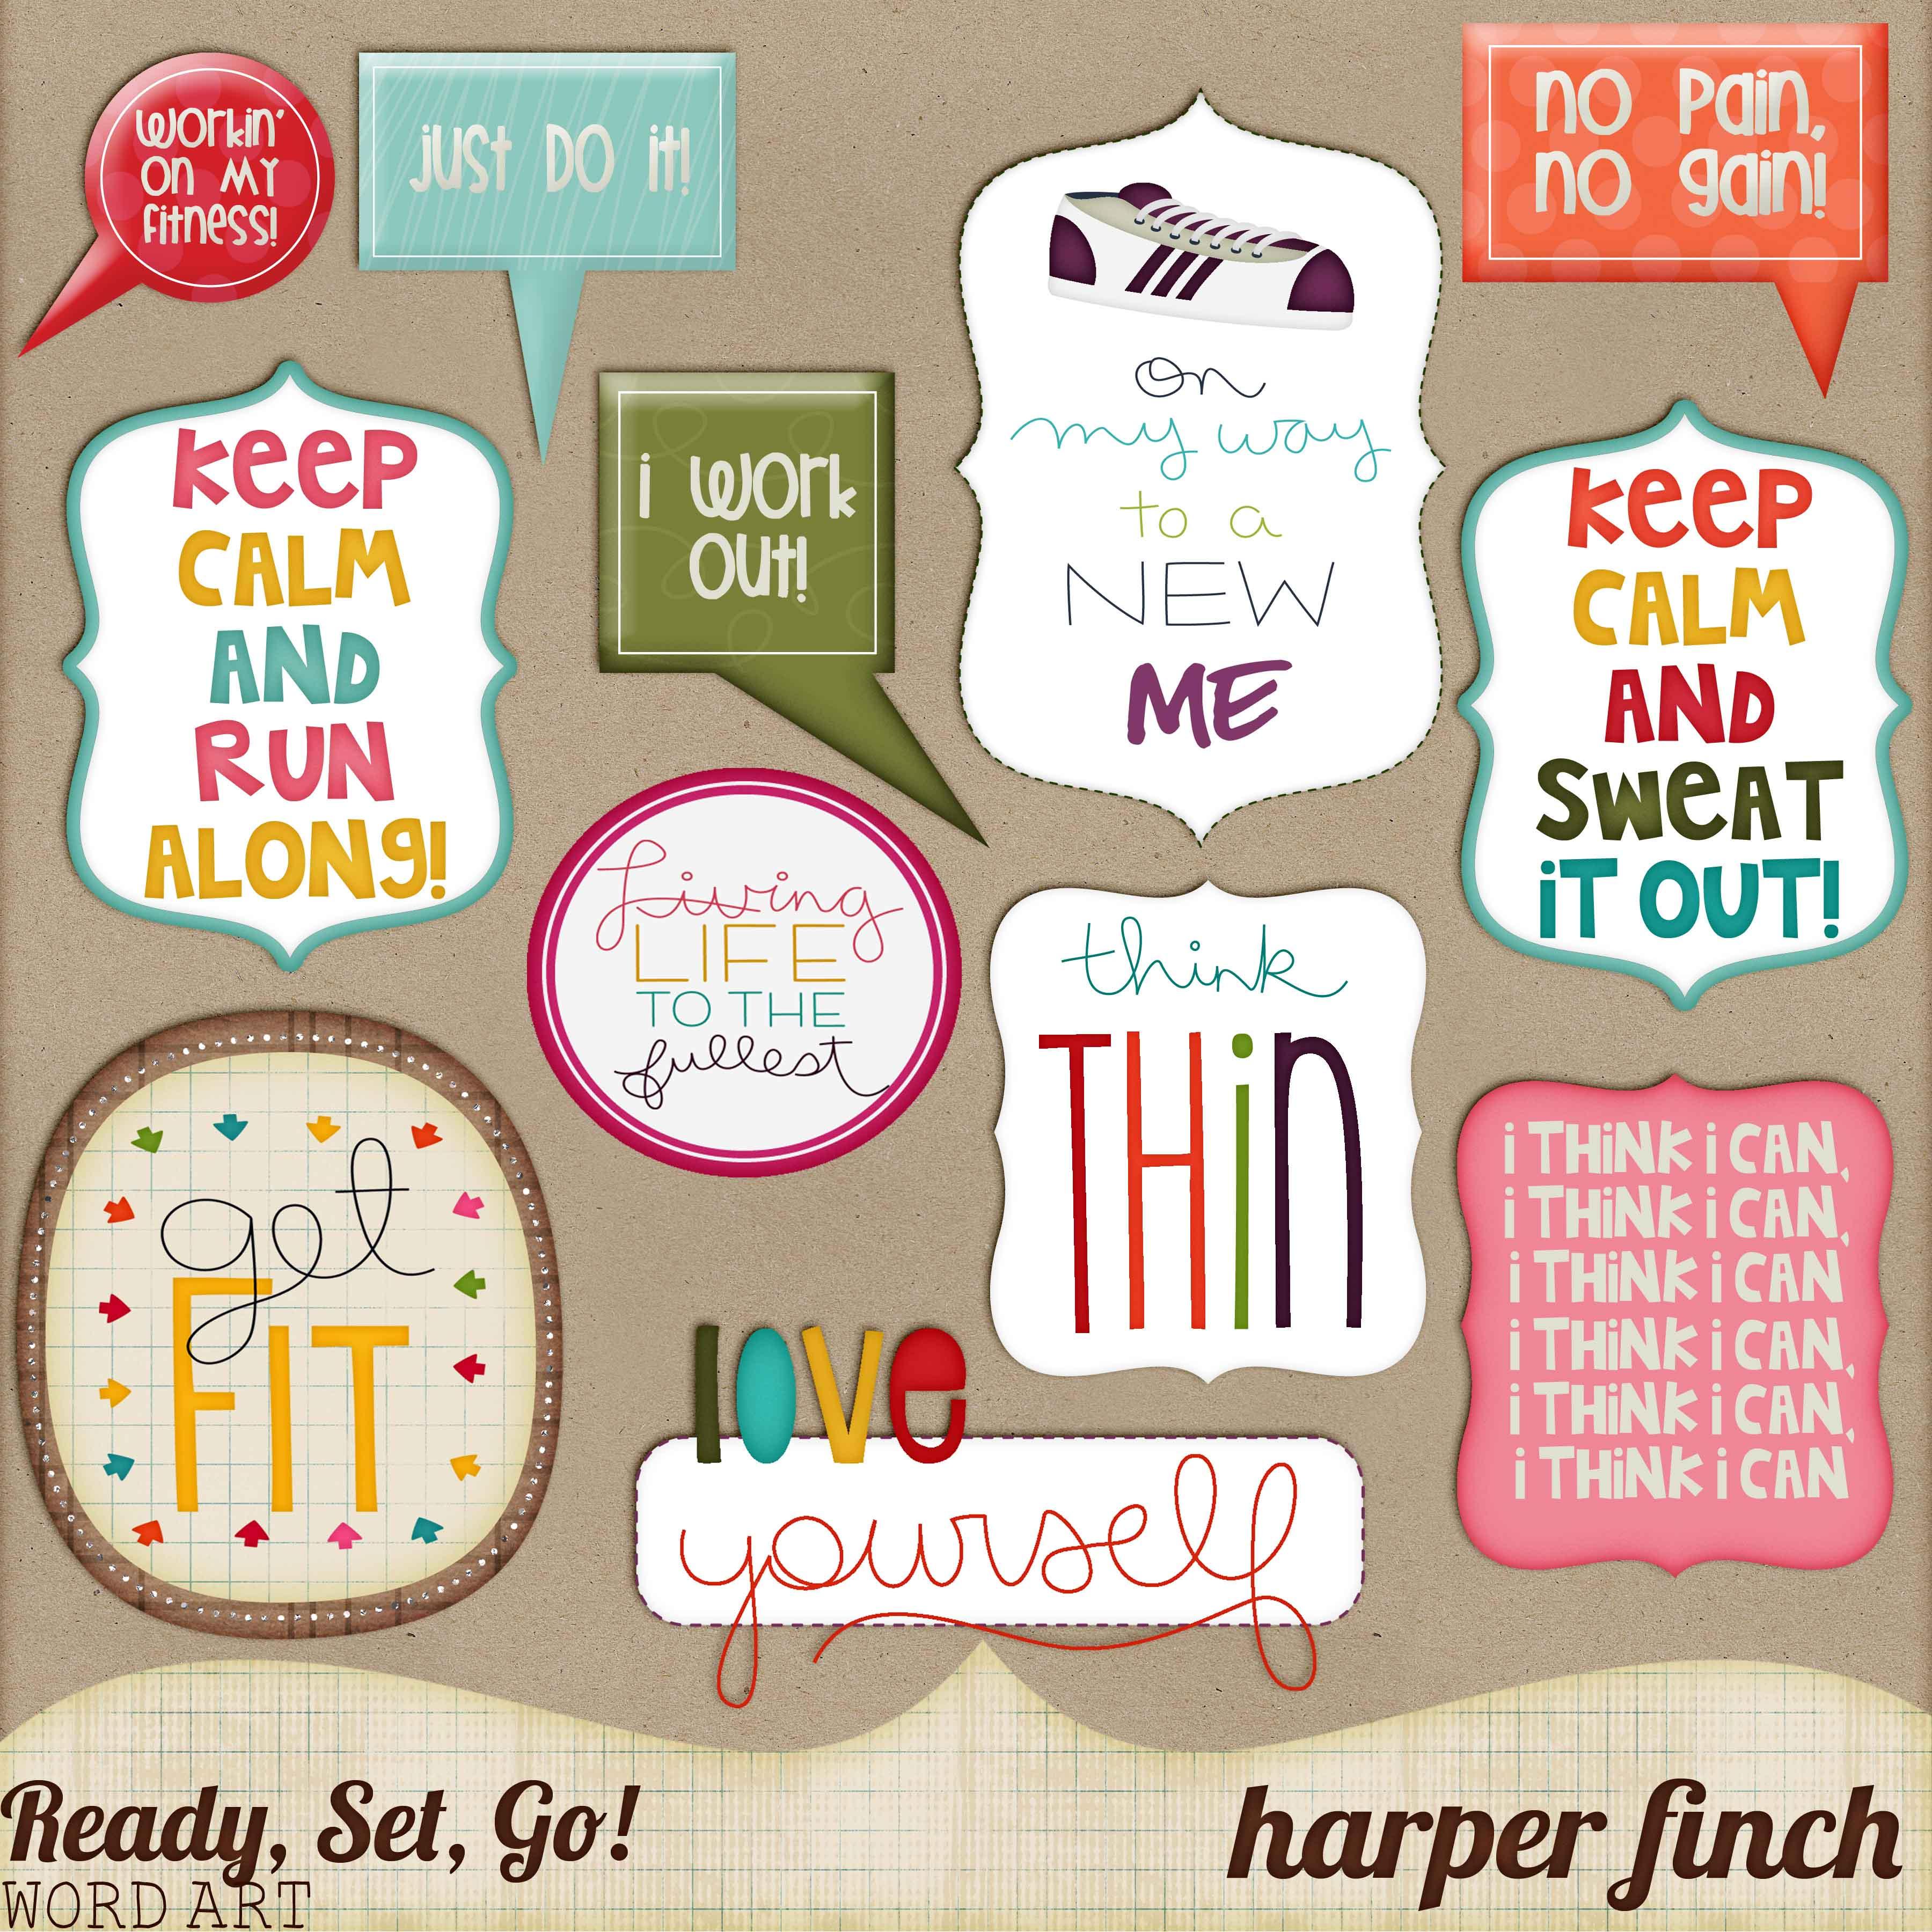 Ready, Set, Go! Series, Word Art by harperfinch